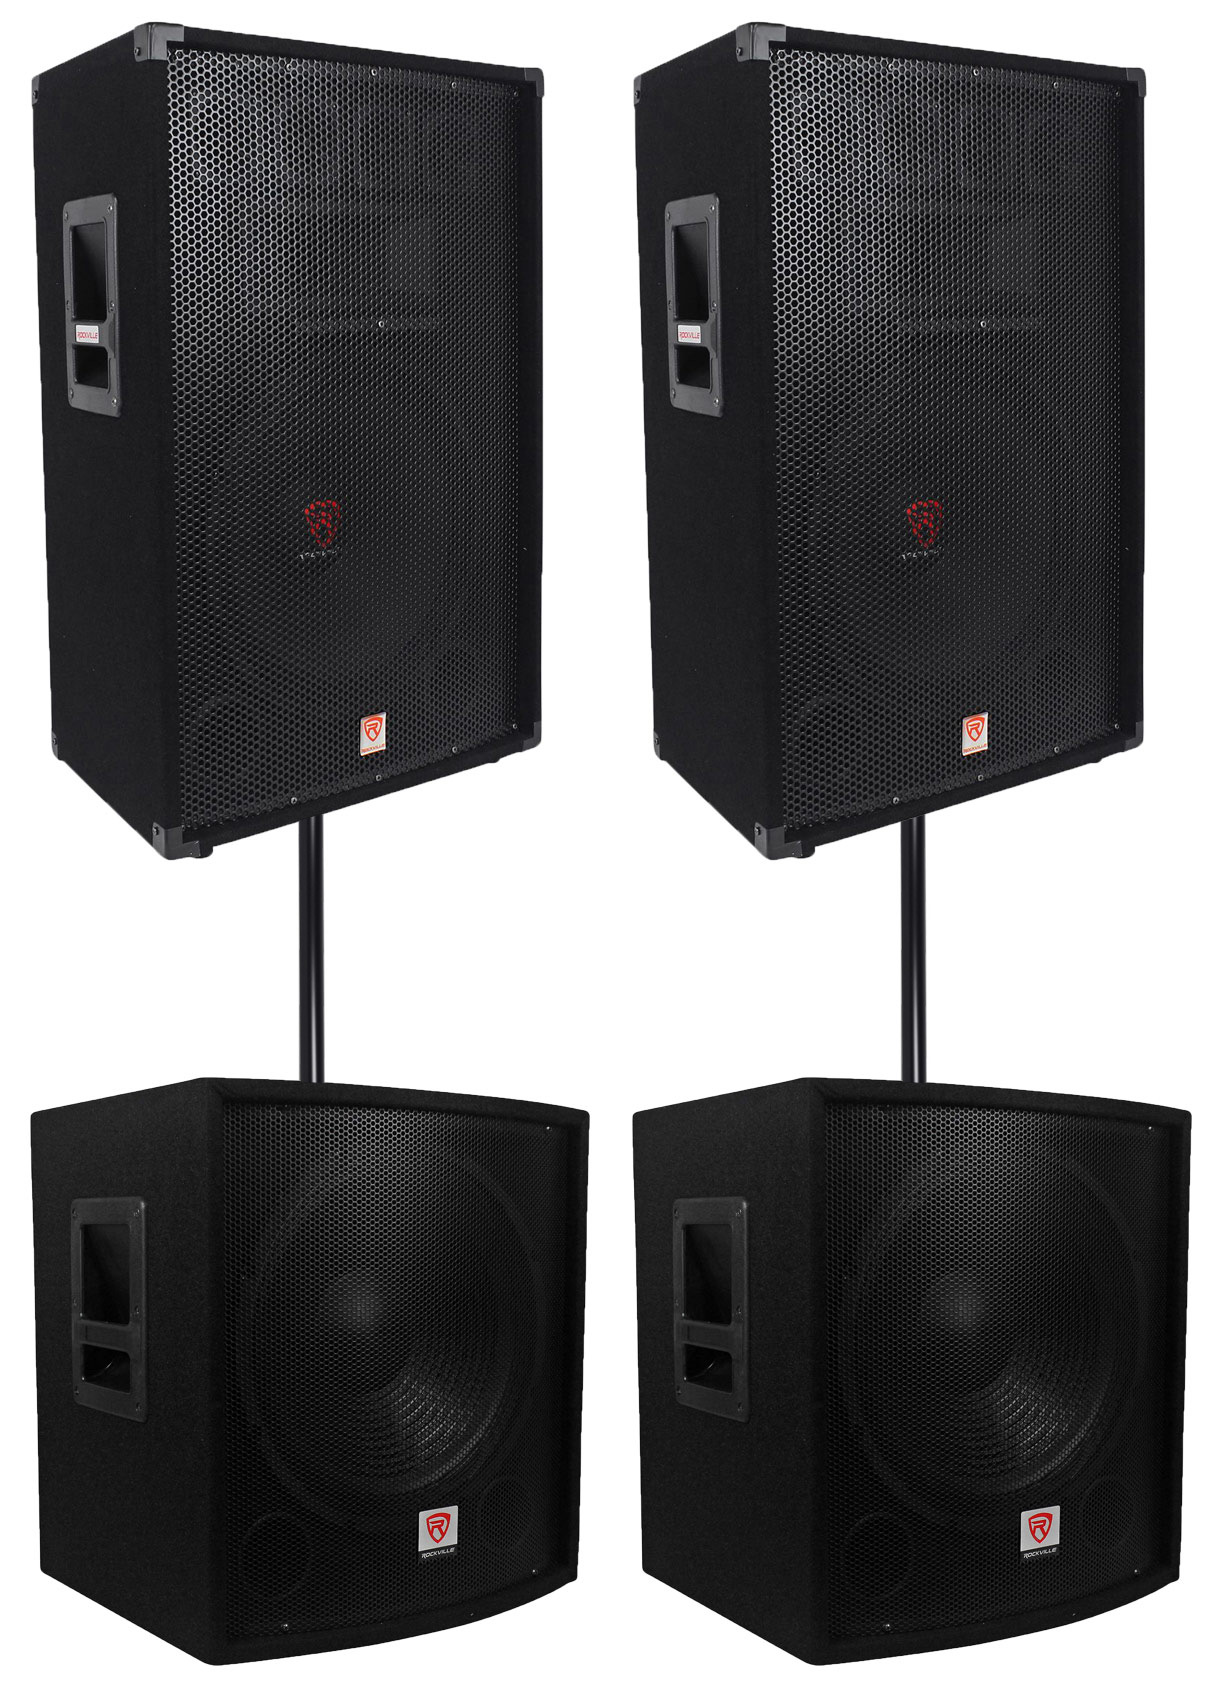 2 rockville rsg15 15 3000w passive dj pro audio pa speaker 2 15 subwoofers. Black Bedroom Furniture Sets. Home Design Ideas